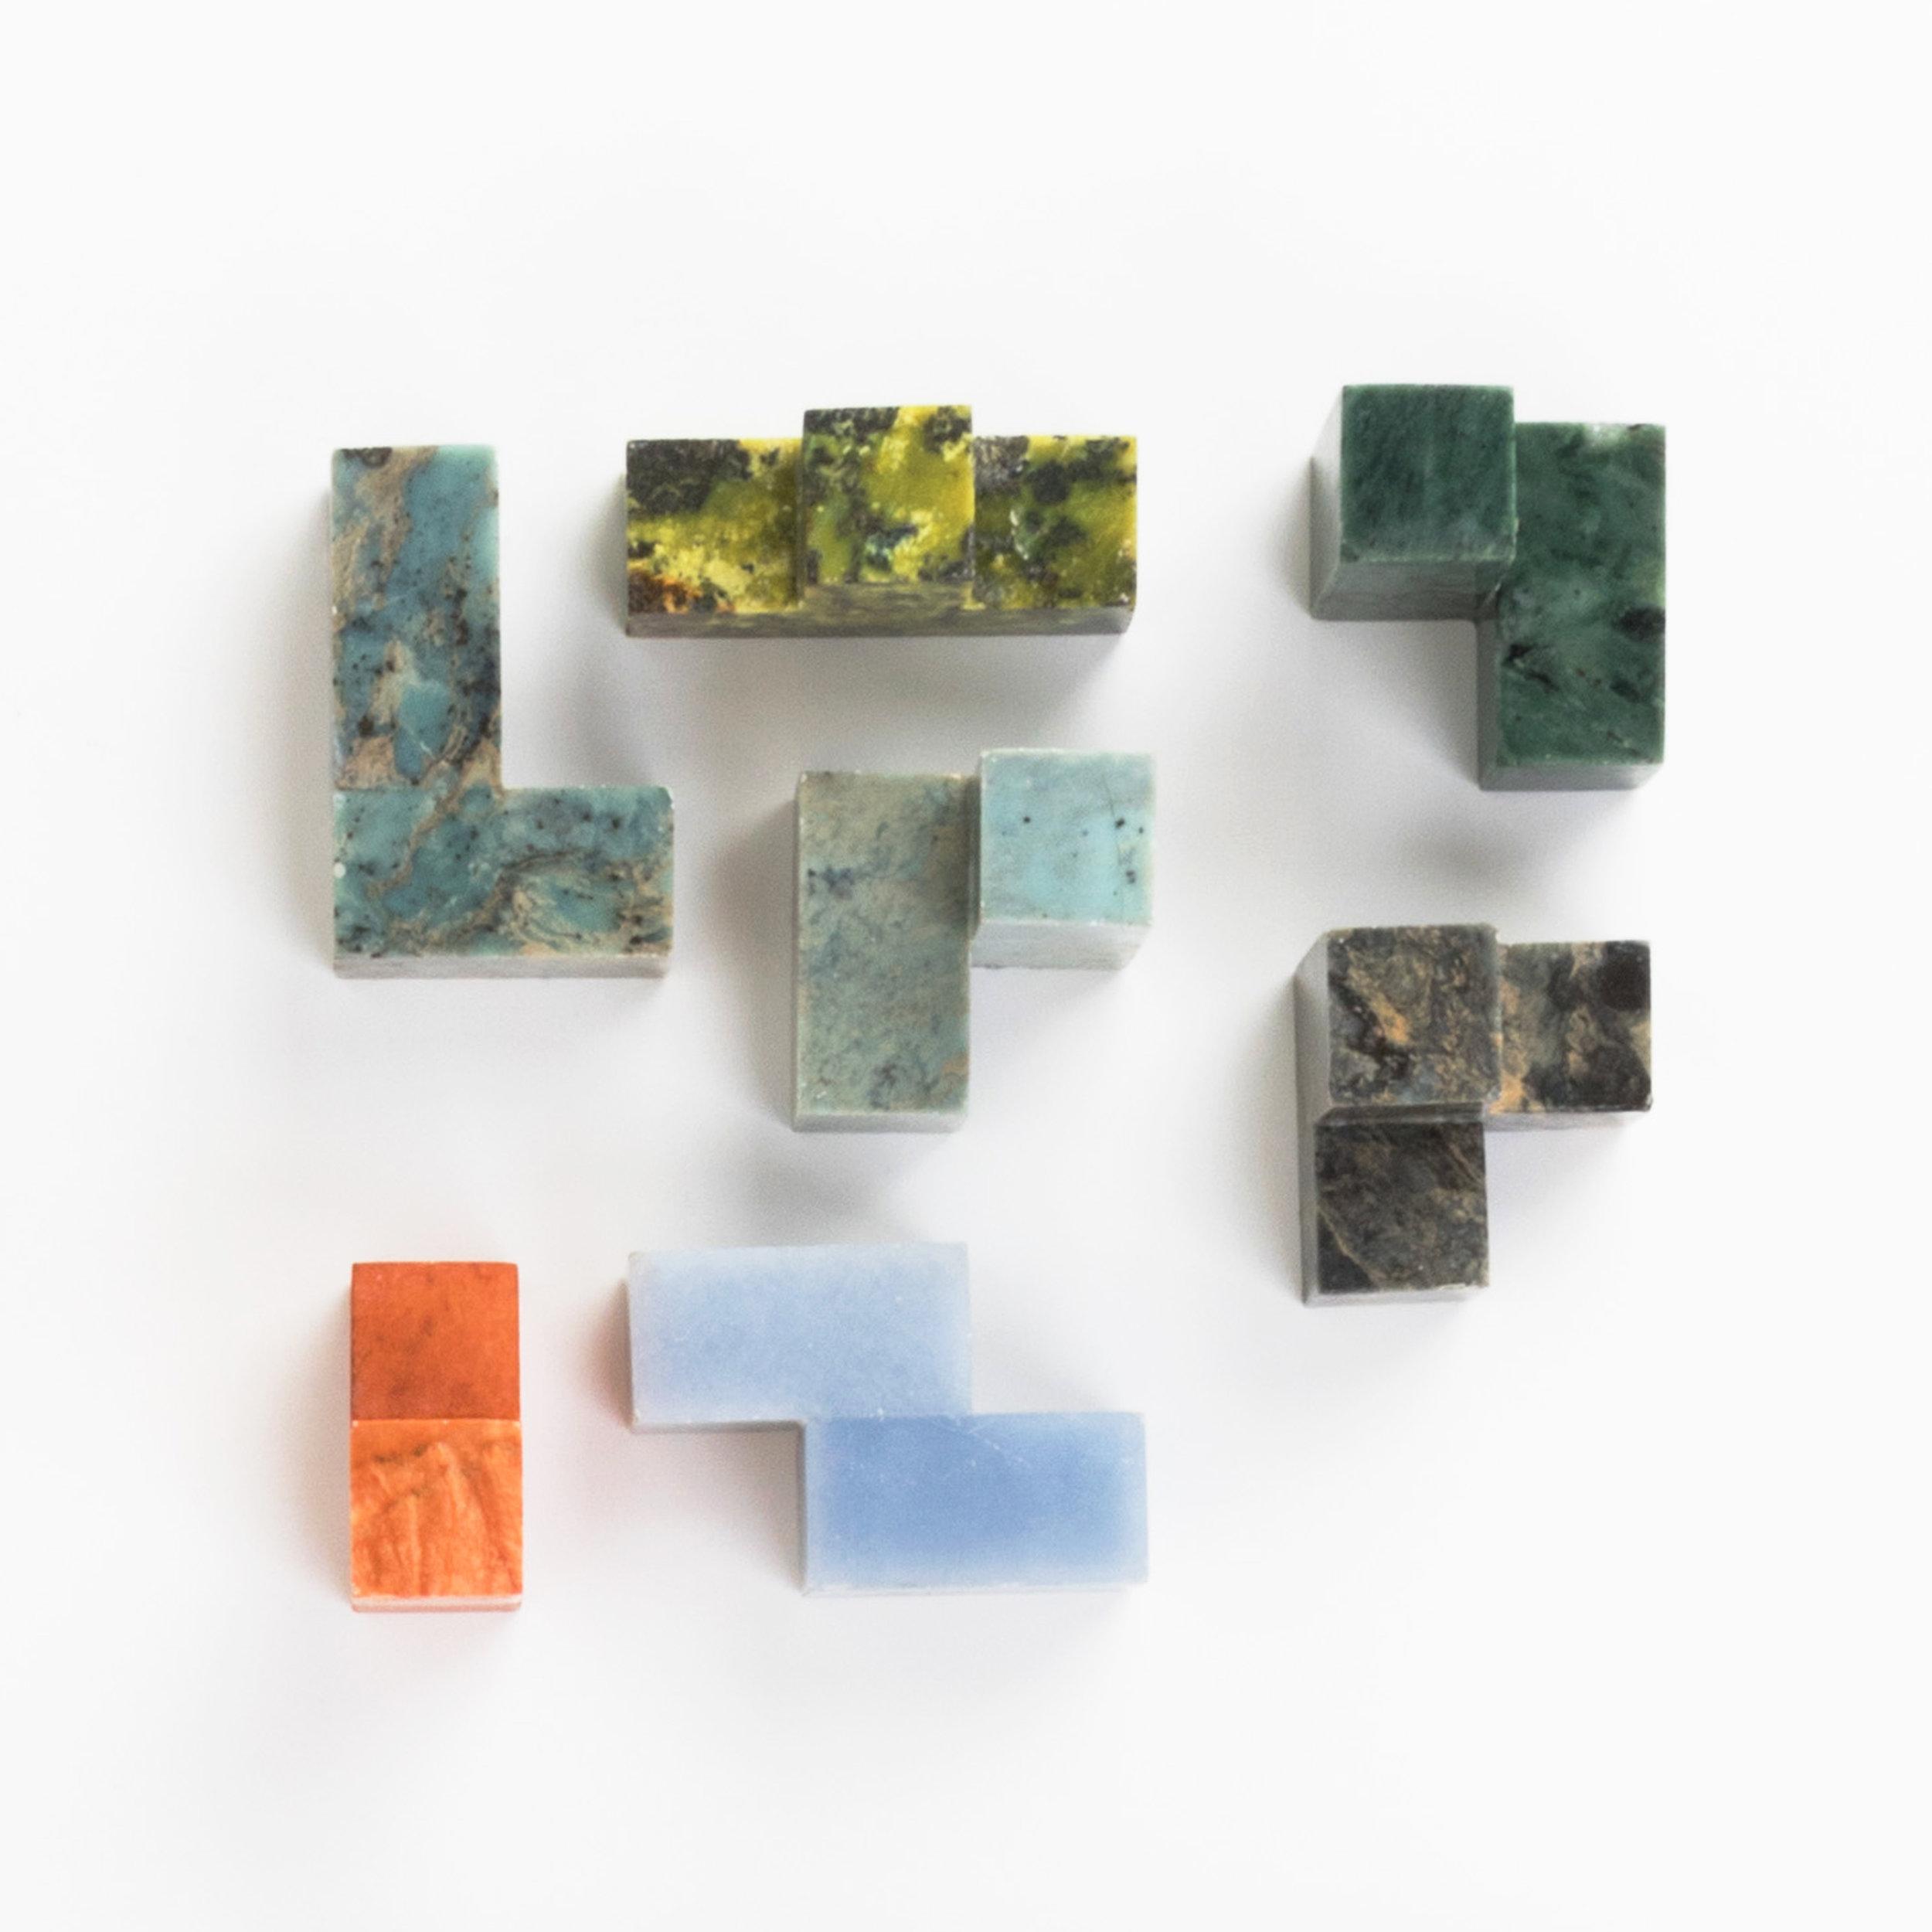 DAR-Projects-Kux-Games-Cube2.jpg